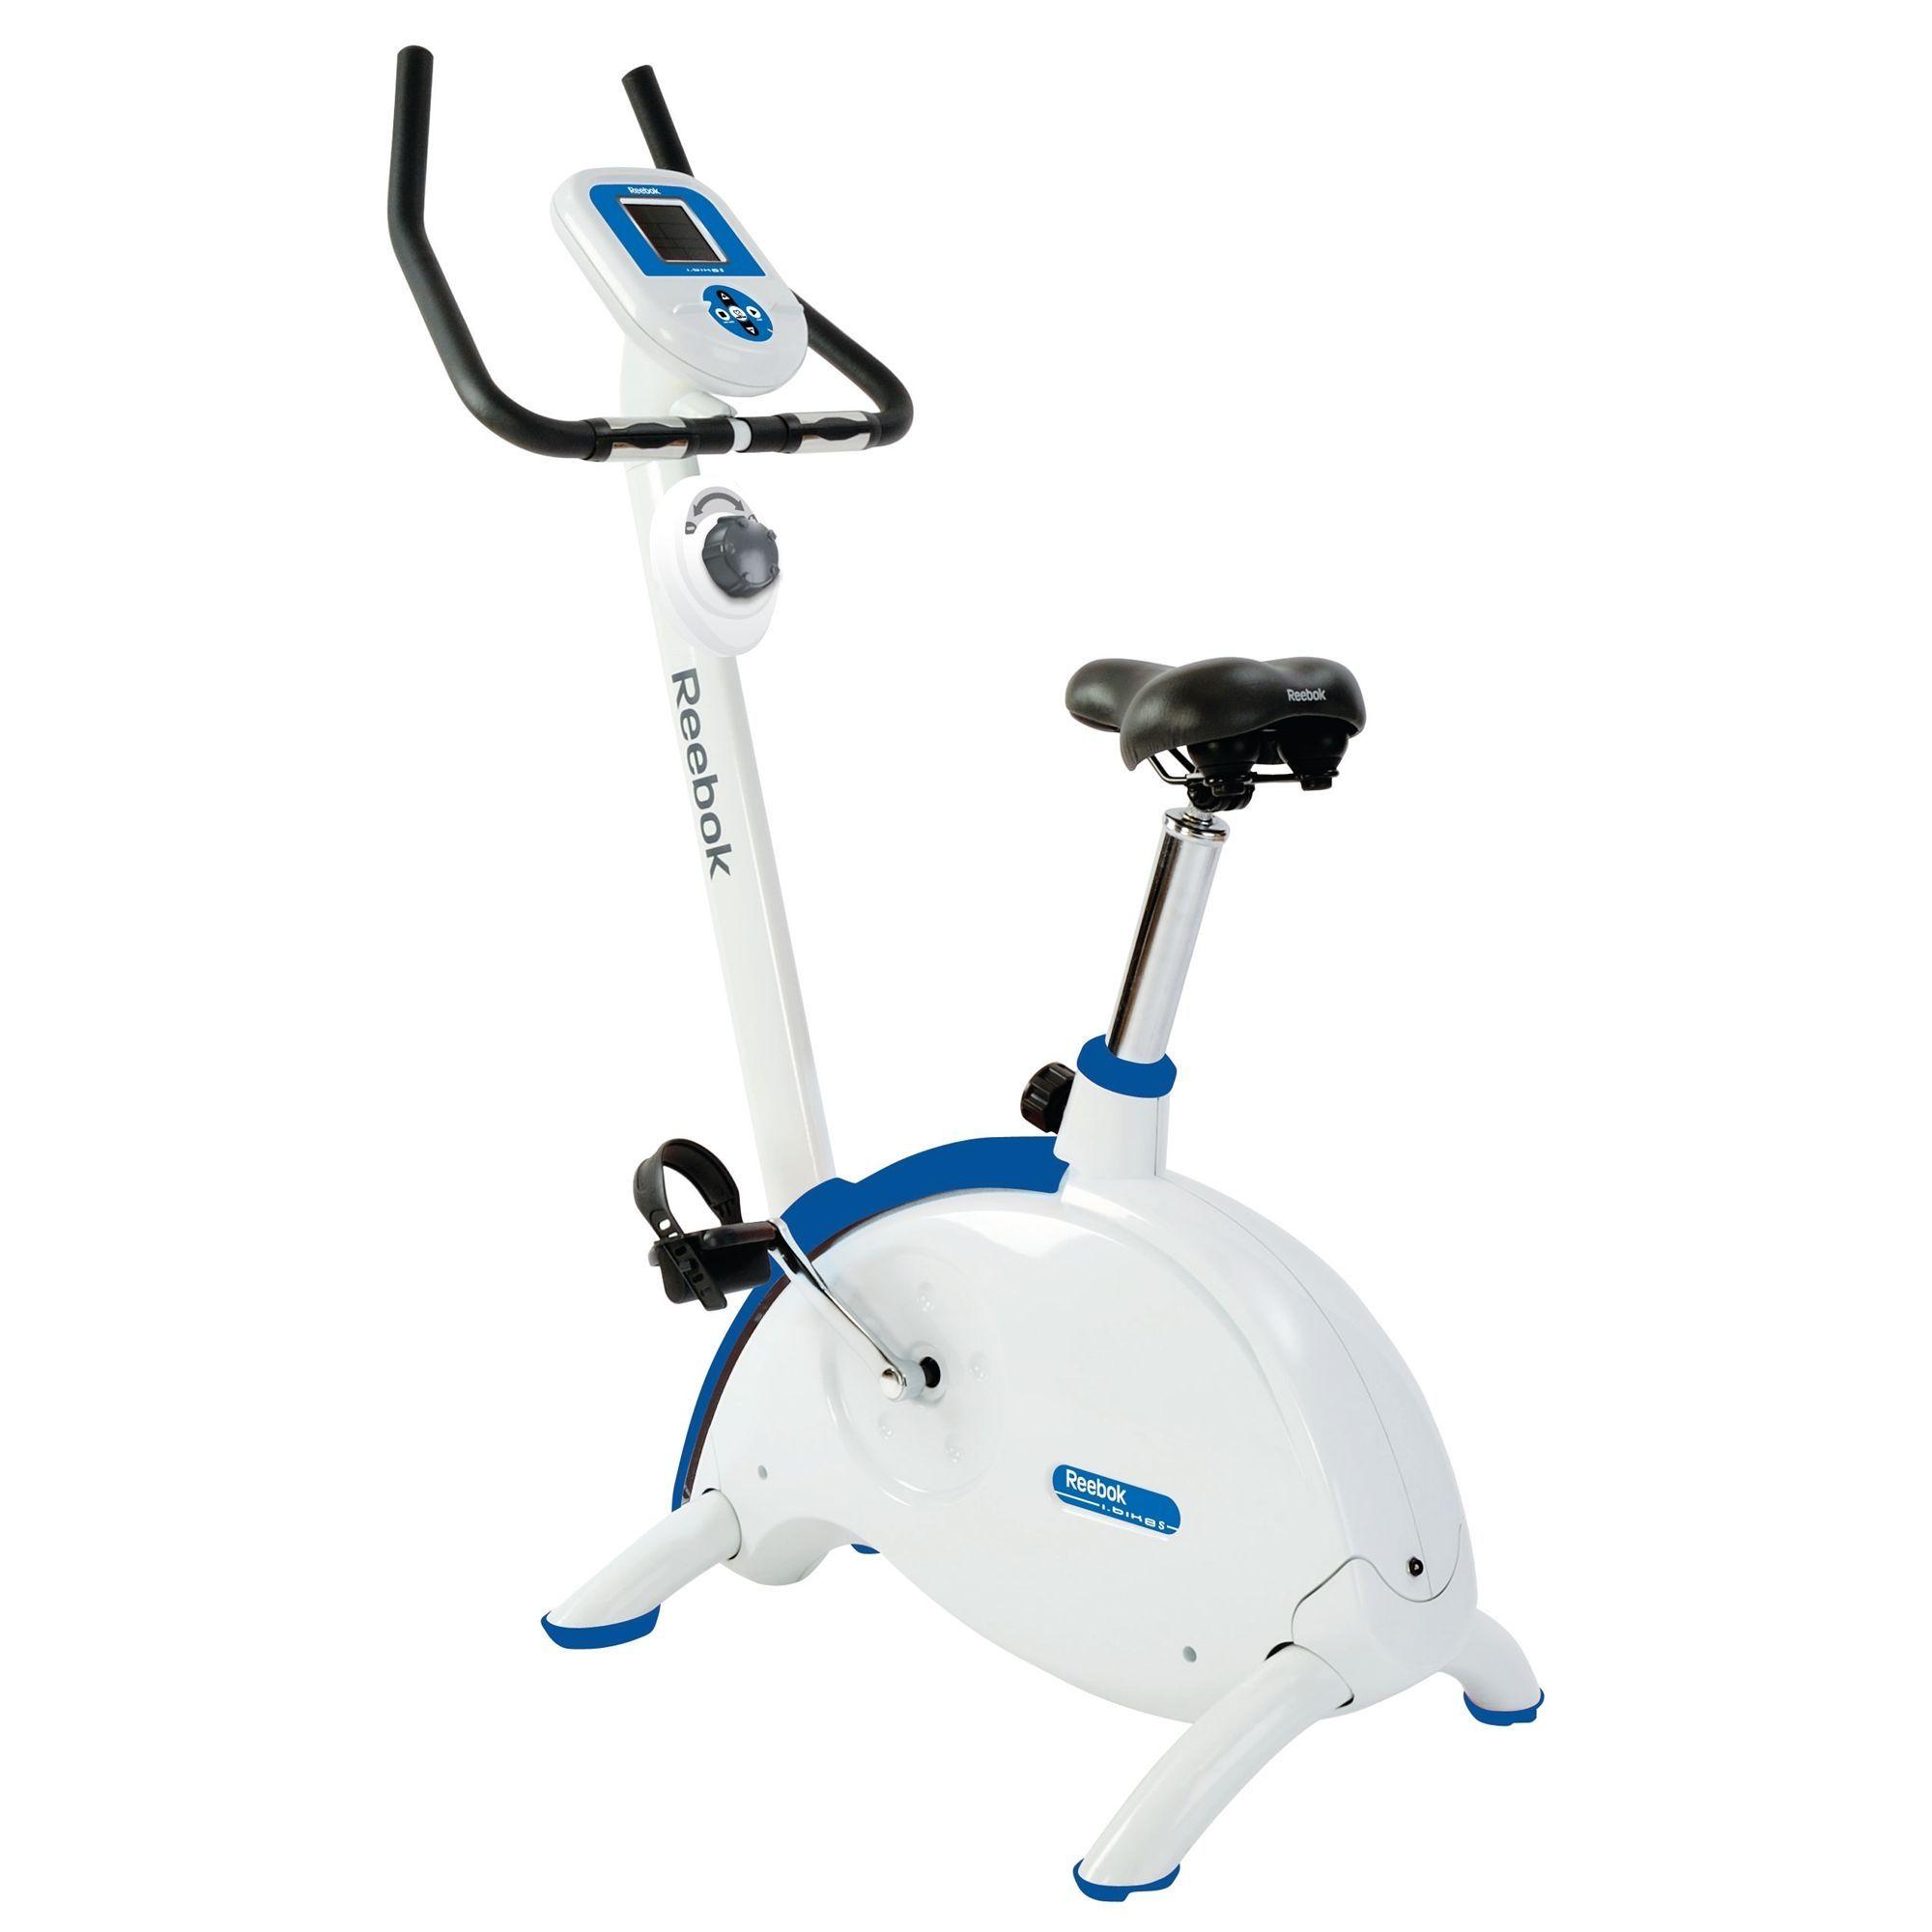 Reebok I Bike S Exercise Bike 2011 Model Only 163 169 00